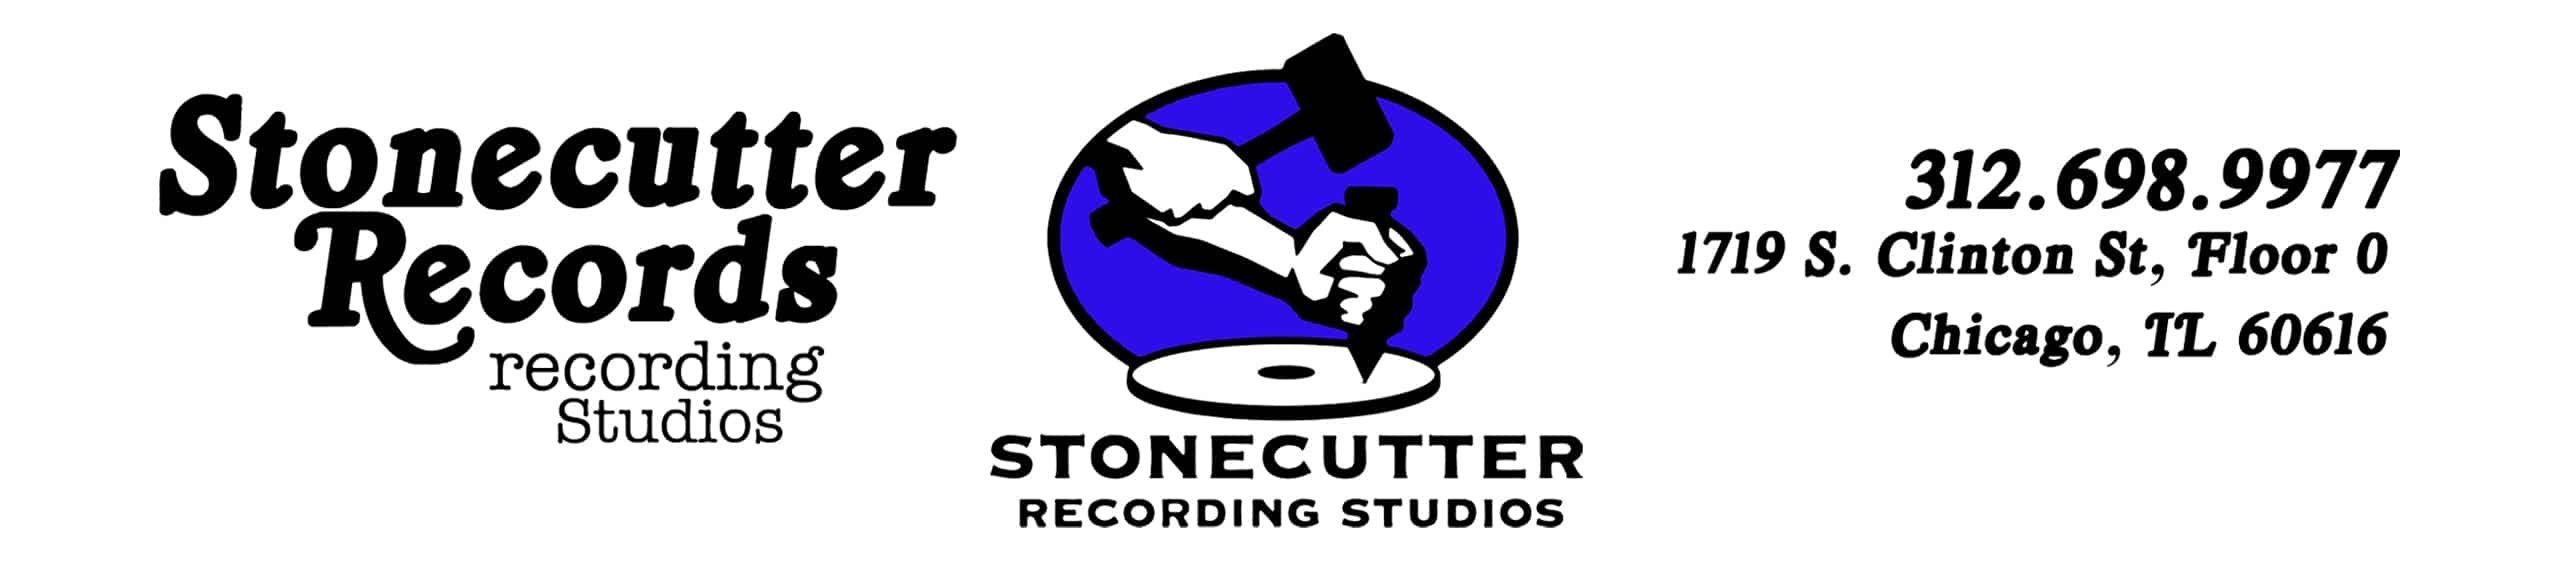 Stonecutter Web Banner Dutchy copy